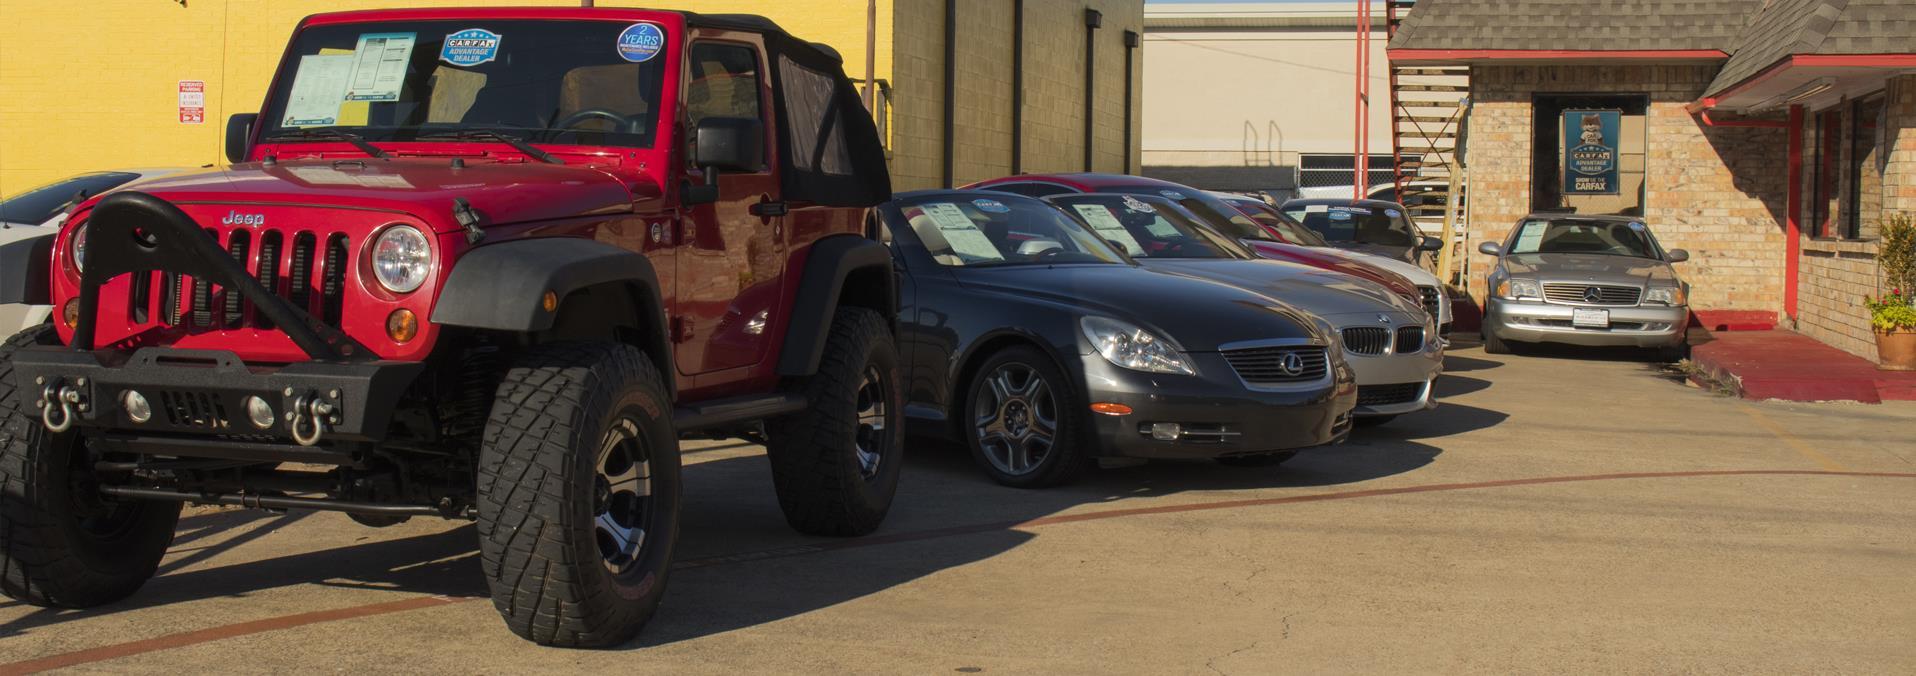 Ride N Drive Garland Dallas Tx New Amp Used Cars Trucks